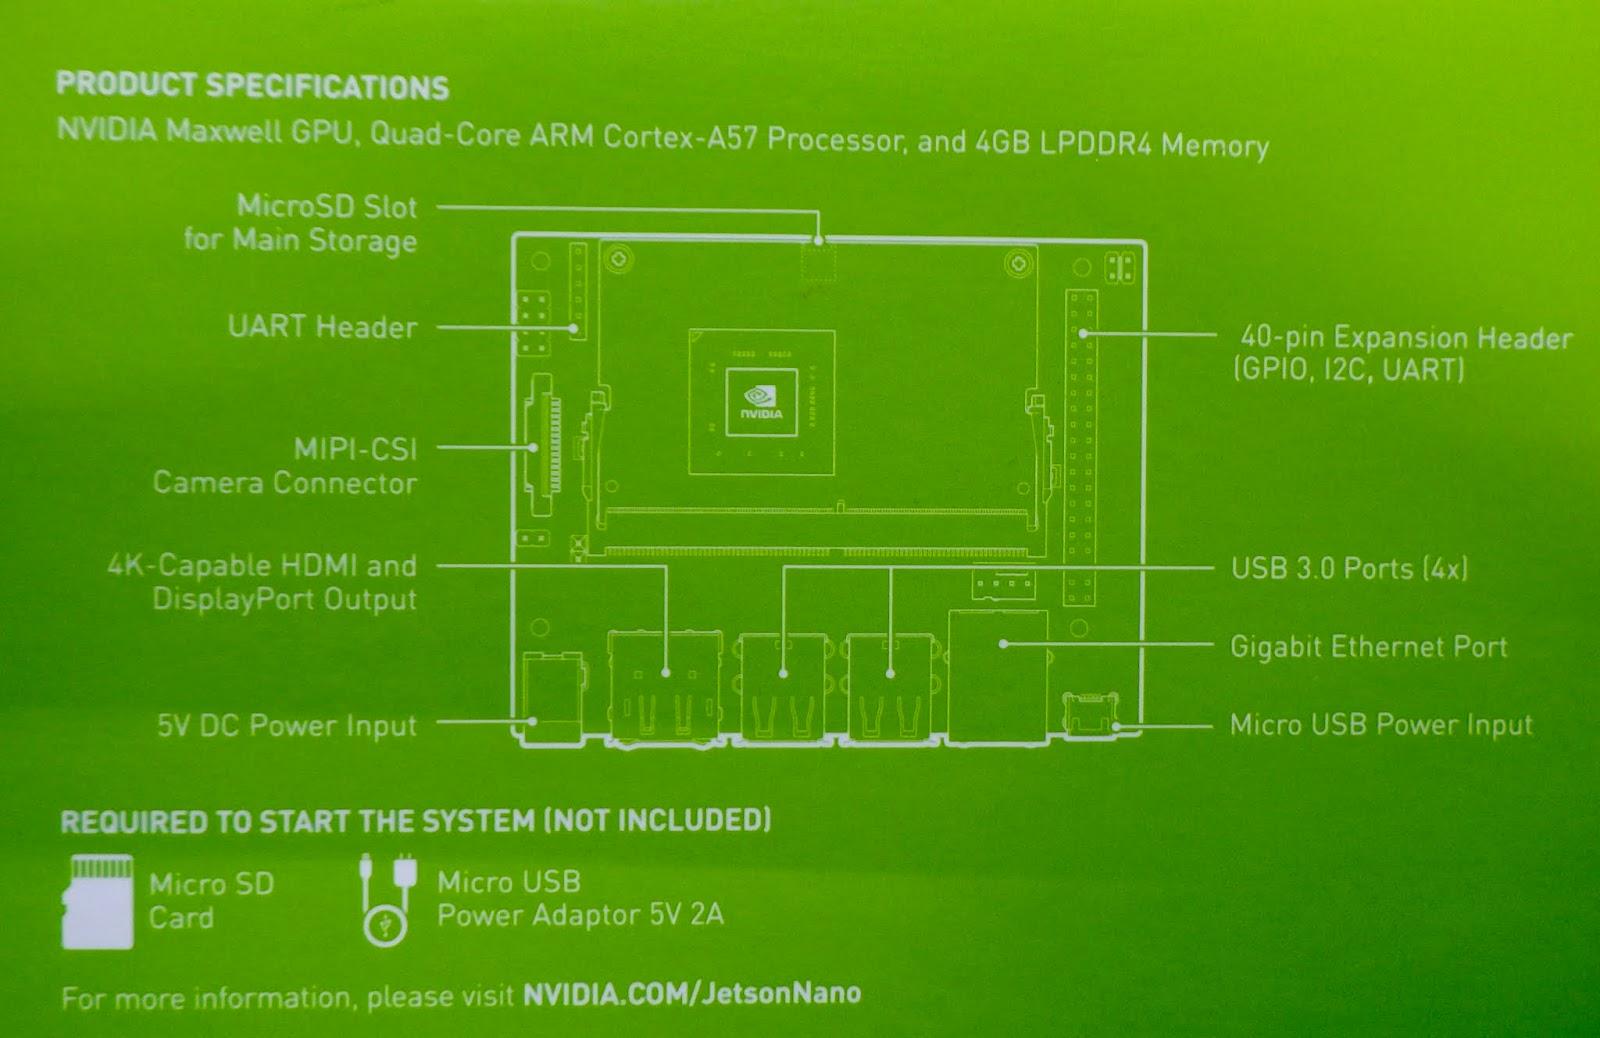 Syonyk's Project Blog: Benchmarking the Brand New nVidia Jetson Nano